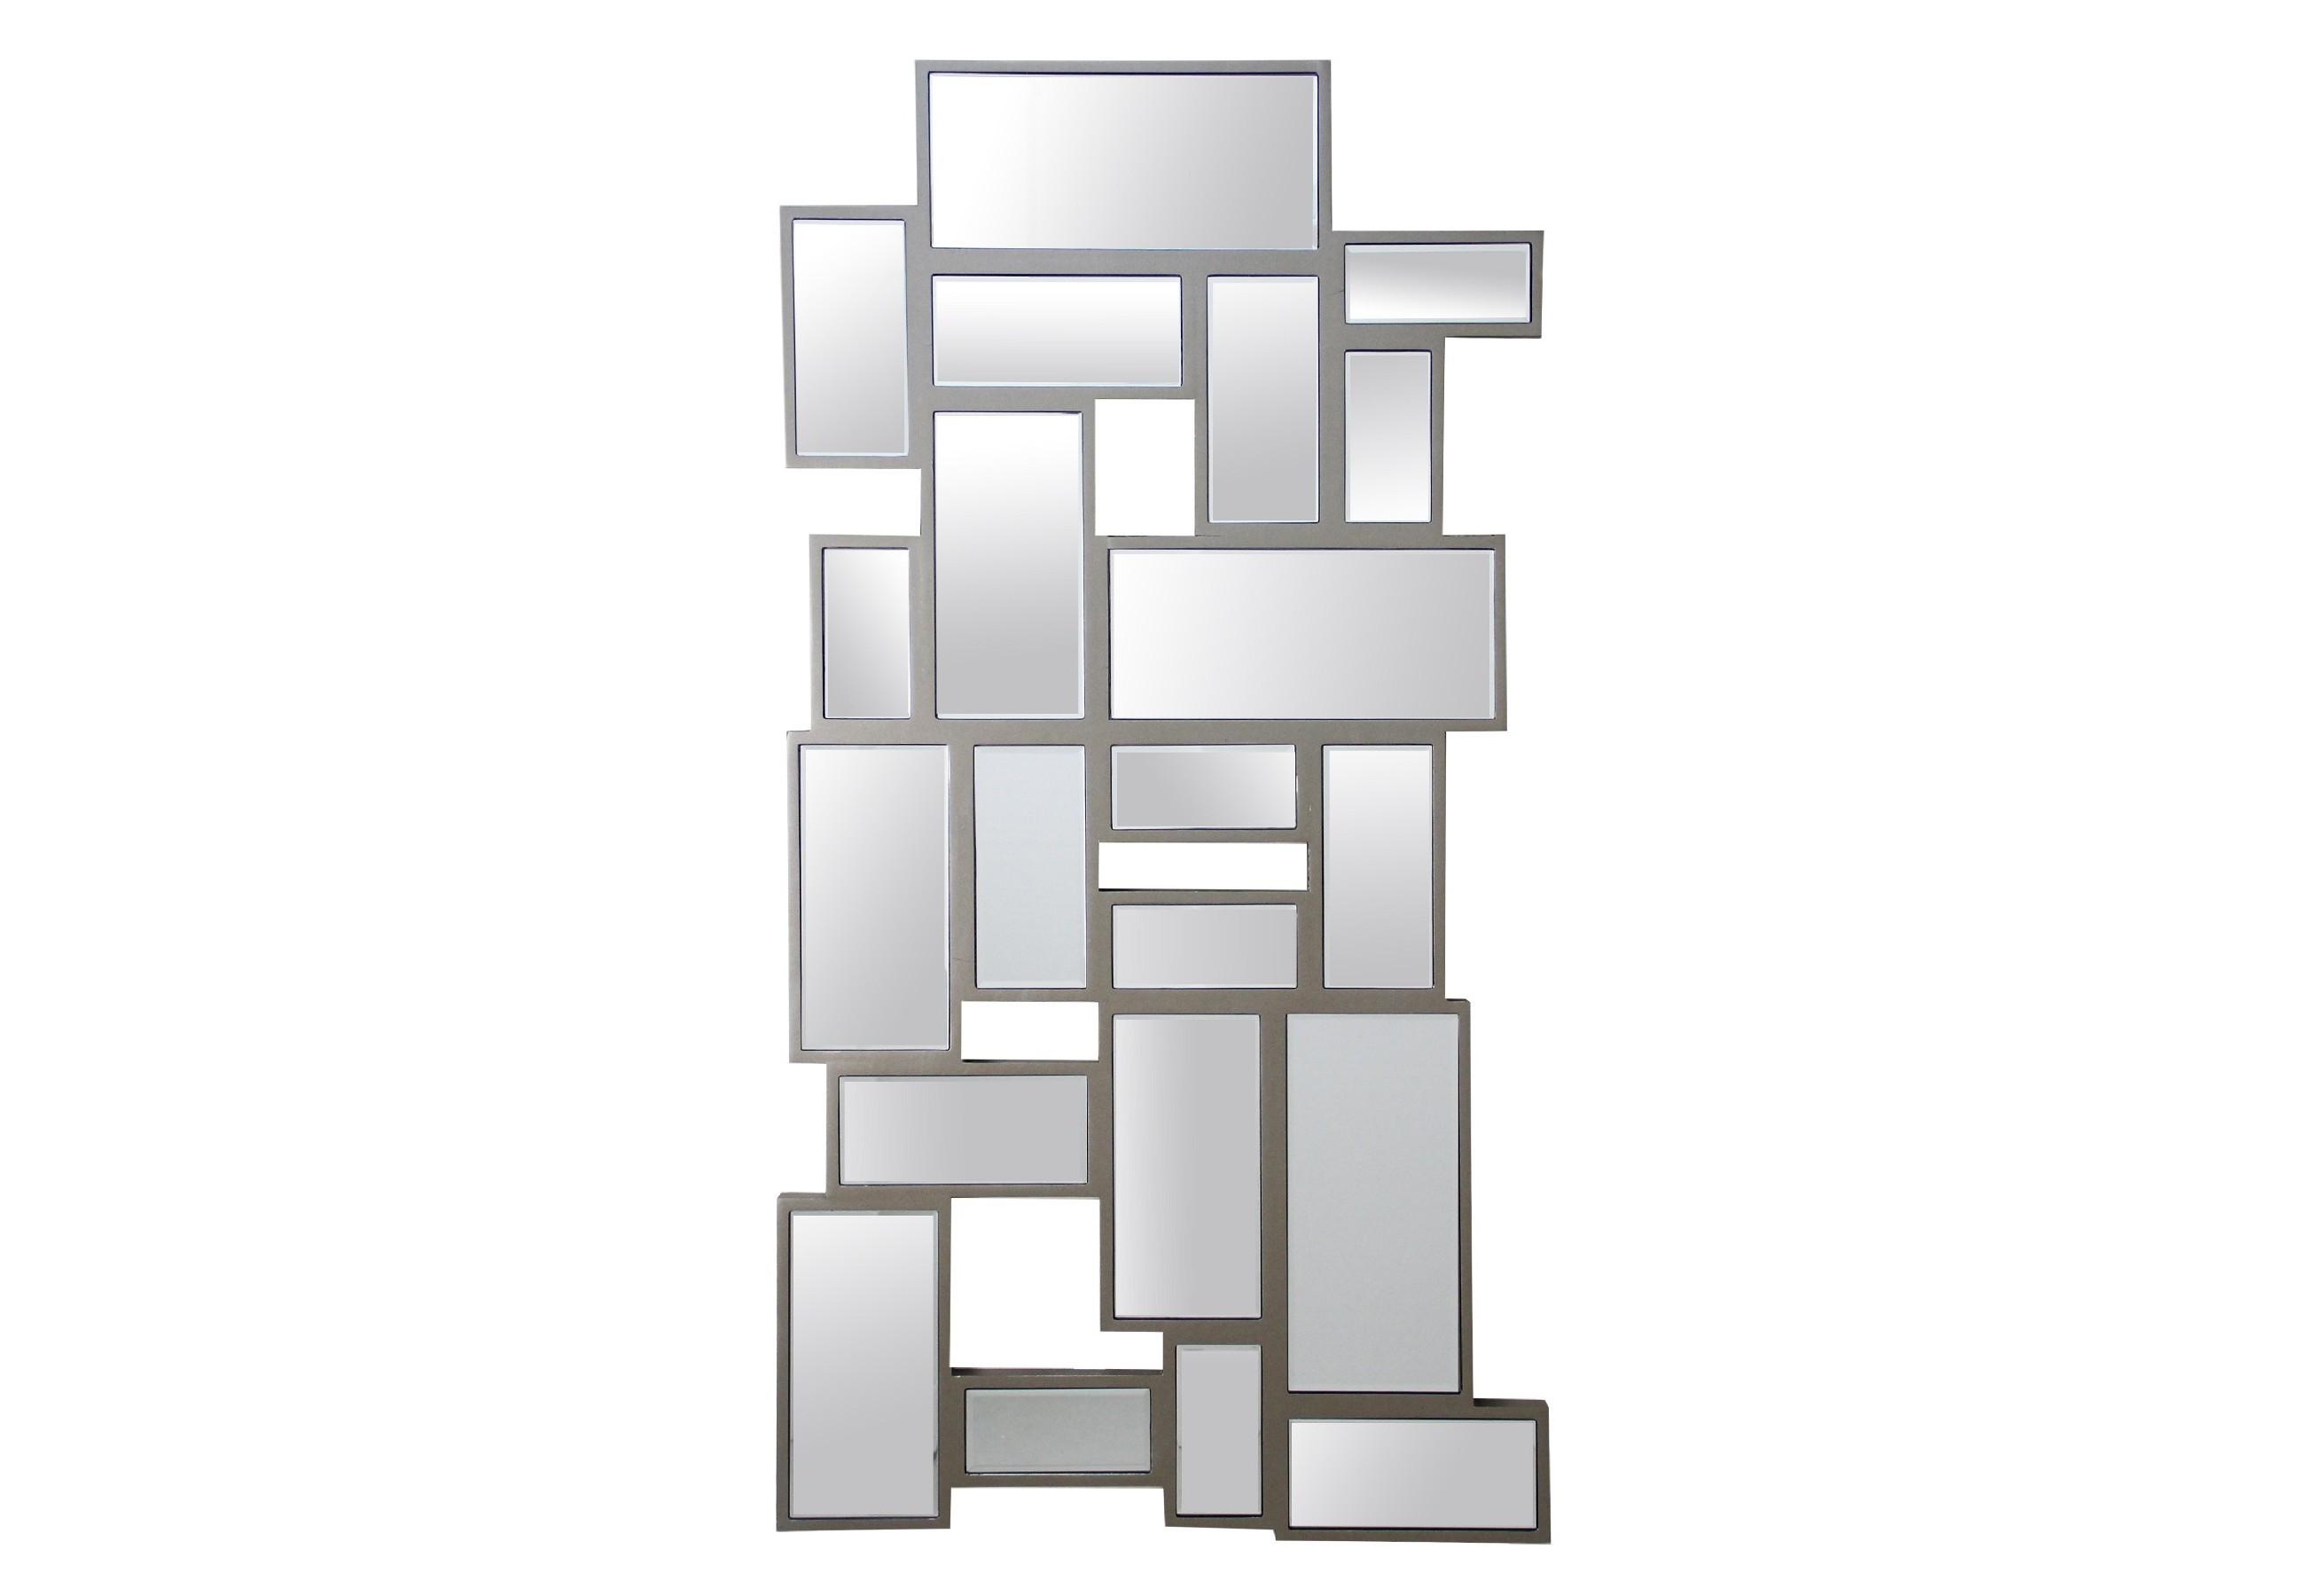 Зеркало DispersioneНастенные зеркала<br><br><br>Material: МДФ<br>Ширина см: 62<br>Высота см: 120<br>Глубина см: 1